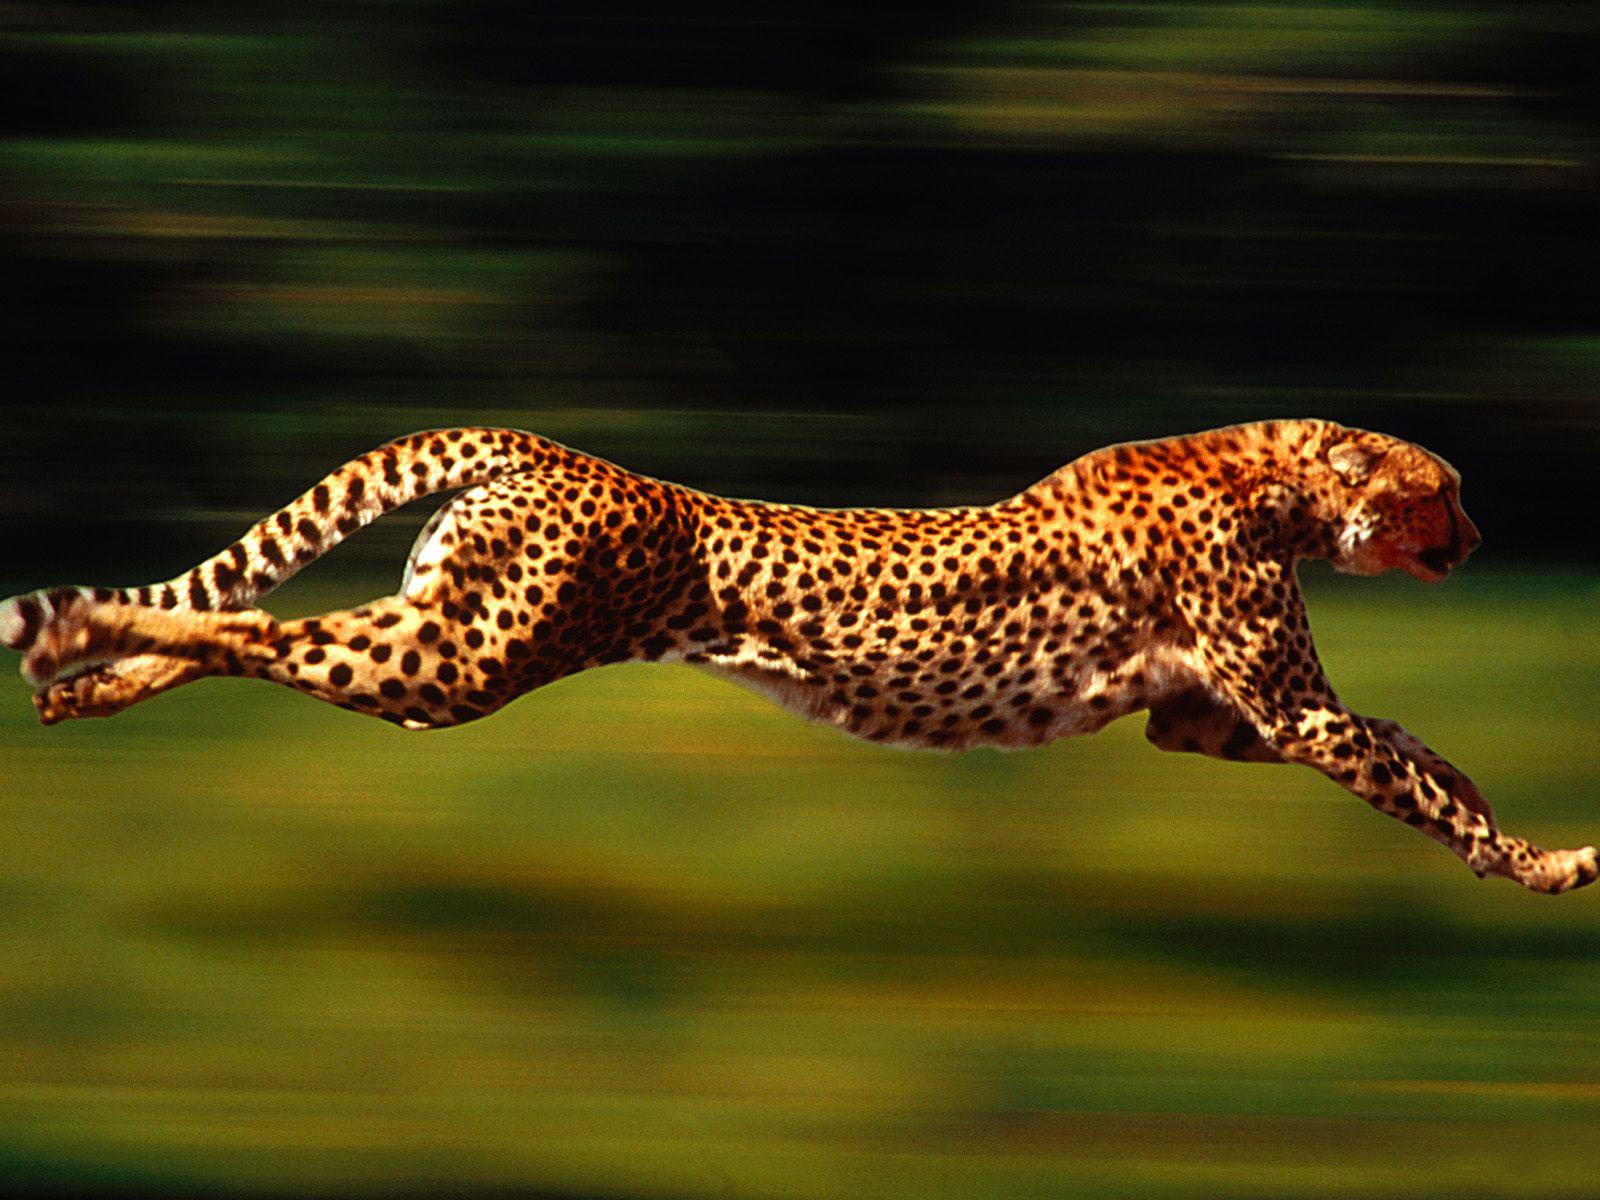 http://3.bp.blogspot.com/-5IrjTpBWQG0/UDRxKB8pxNI/AAAAAAAAADs/eqj1fmdr85A/s1600/Wild+Africa+Animals+Apple+Leopard177.jpg